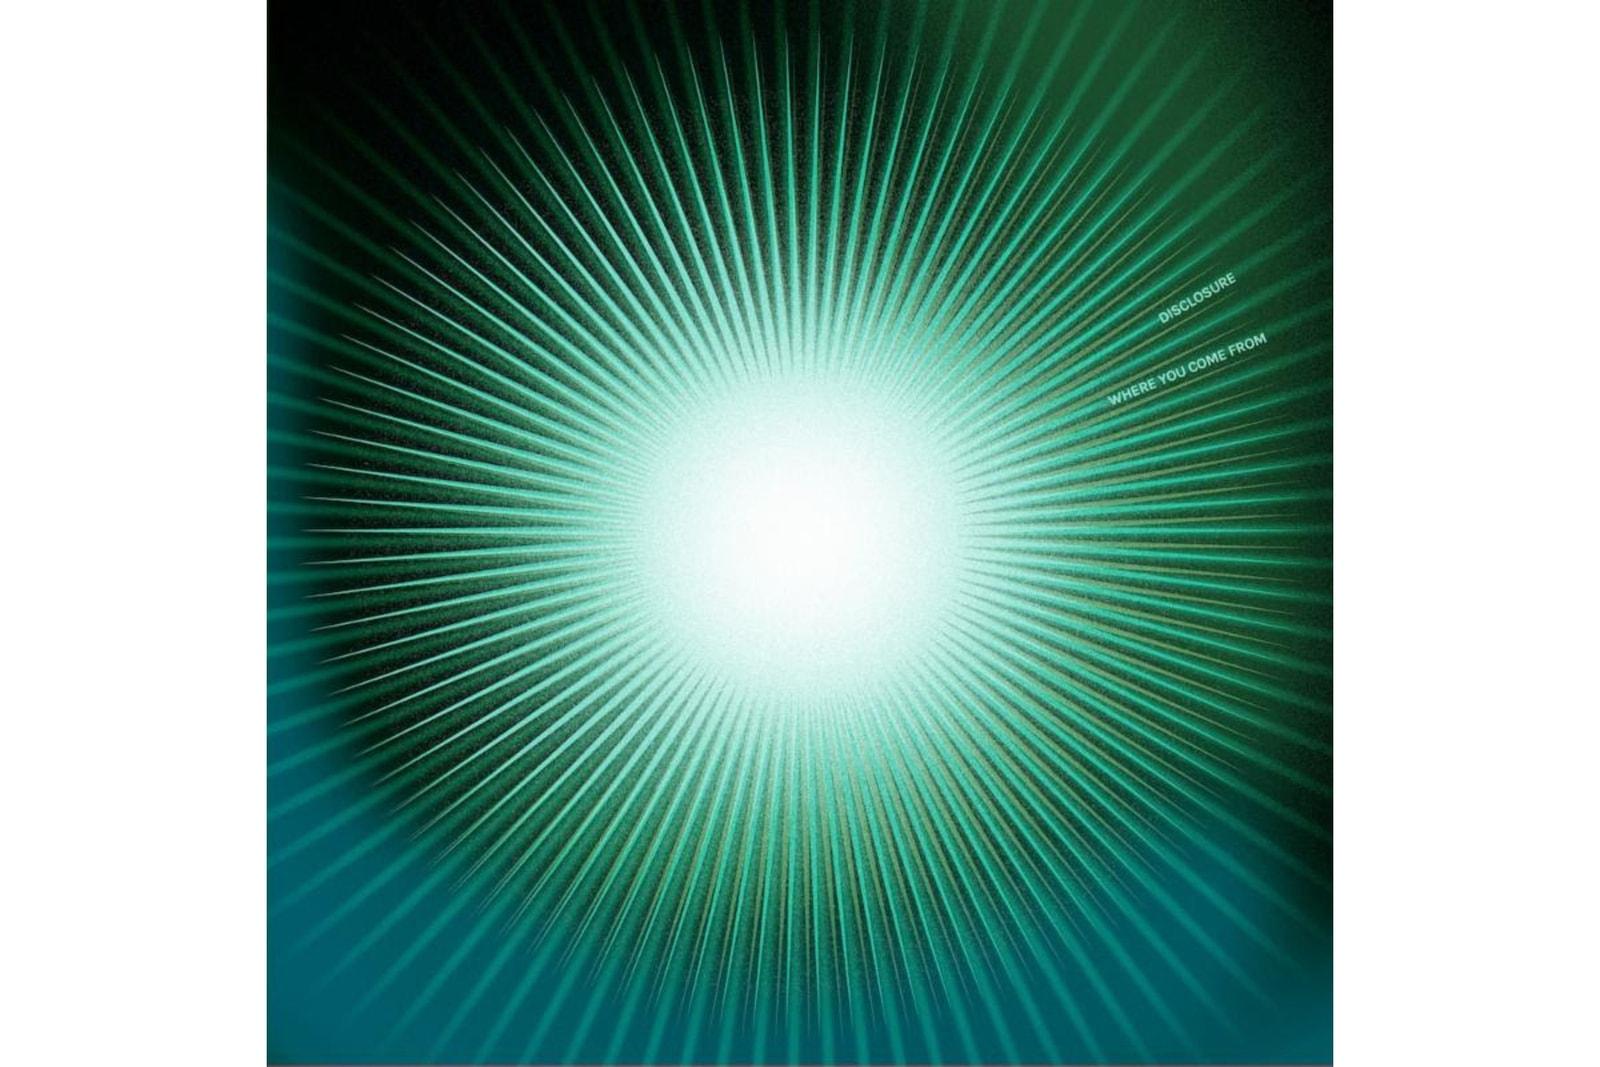 HYPEBEAST ハイプビースト 編集部員が選ぶ注目音楽リリース 5 選 Vol.2(2018/8/20-26)